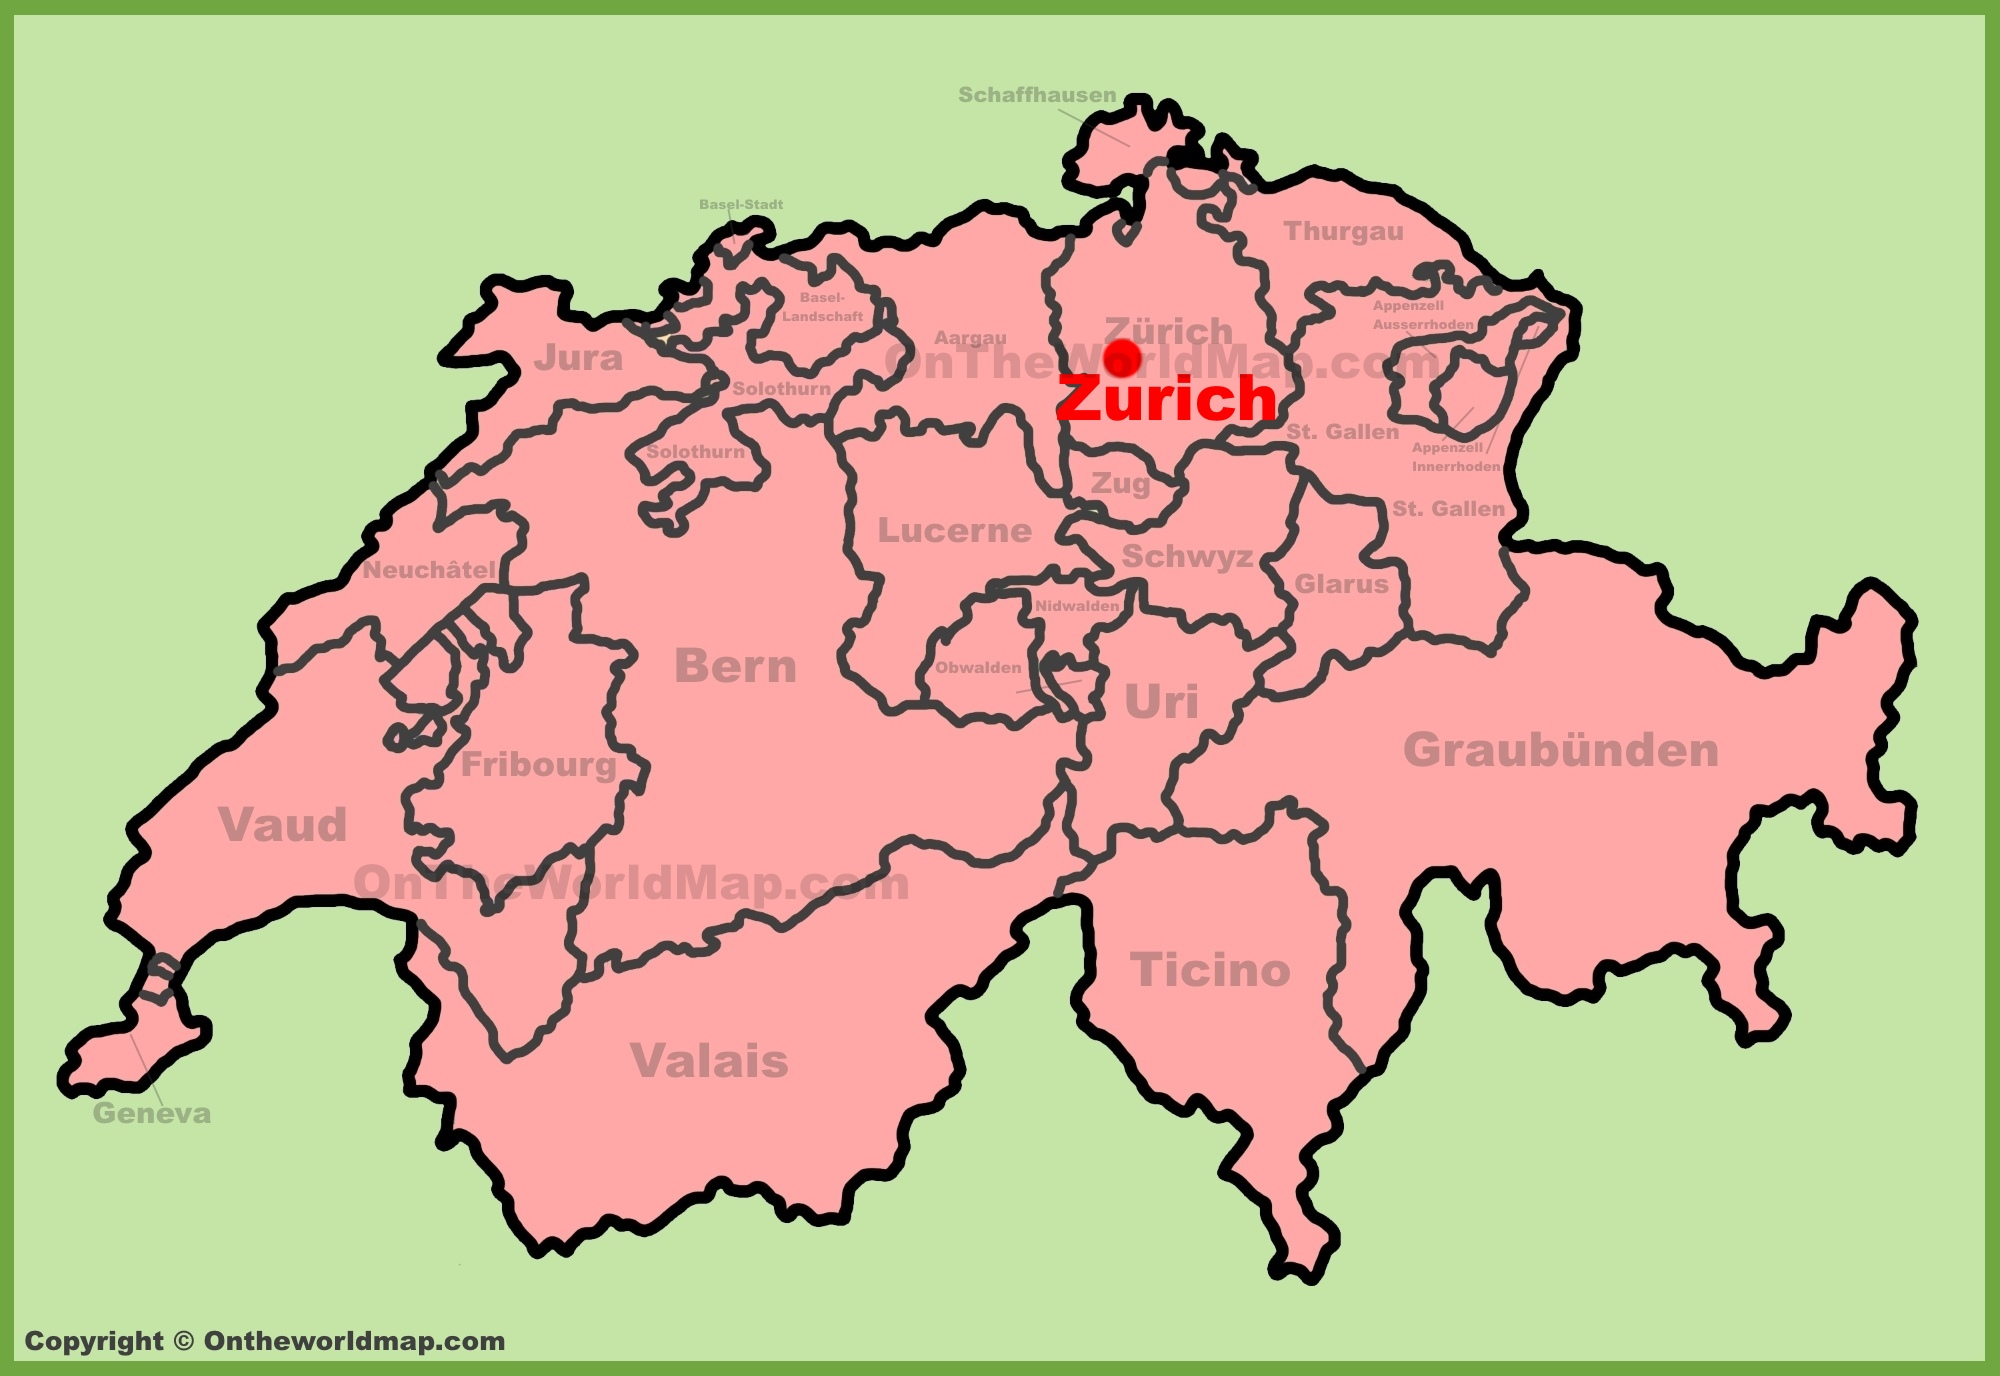 Zrich location on the switzerland map zrich location on the switzerland map gumiabroncs Images